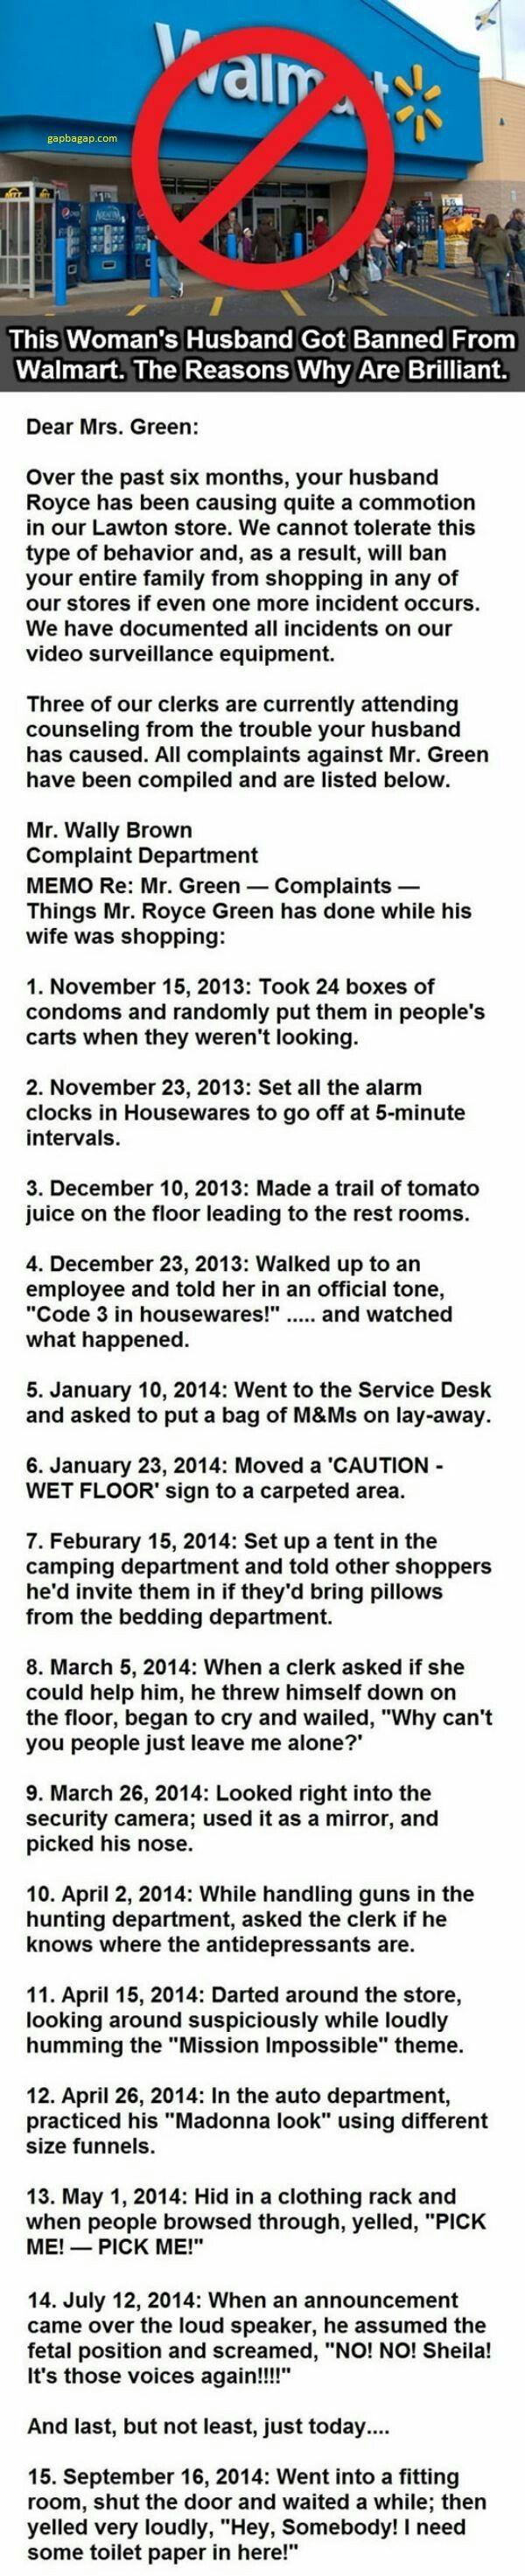 Funny Story About A Husband vs. Walmart